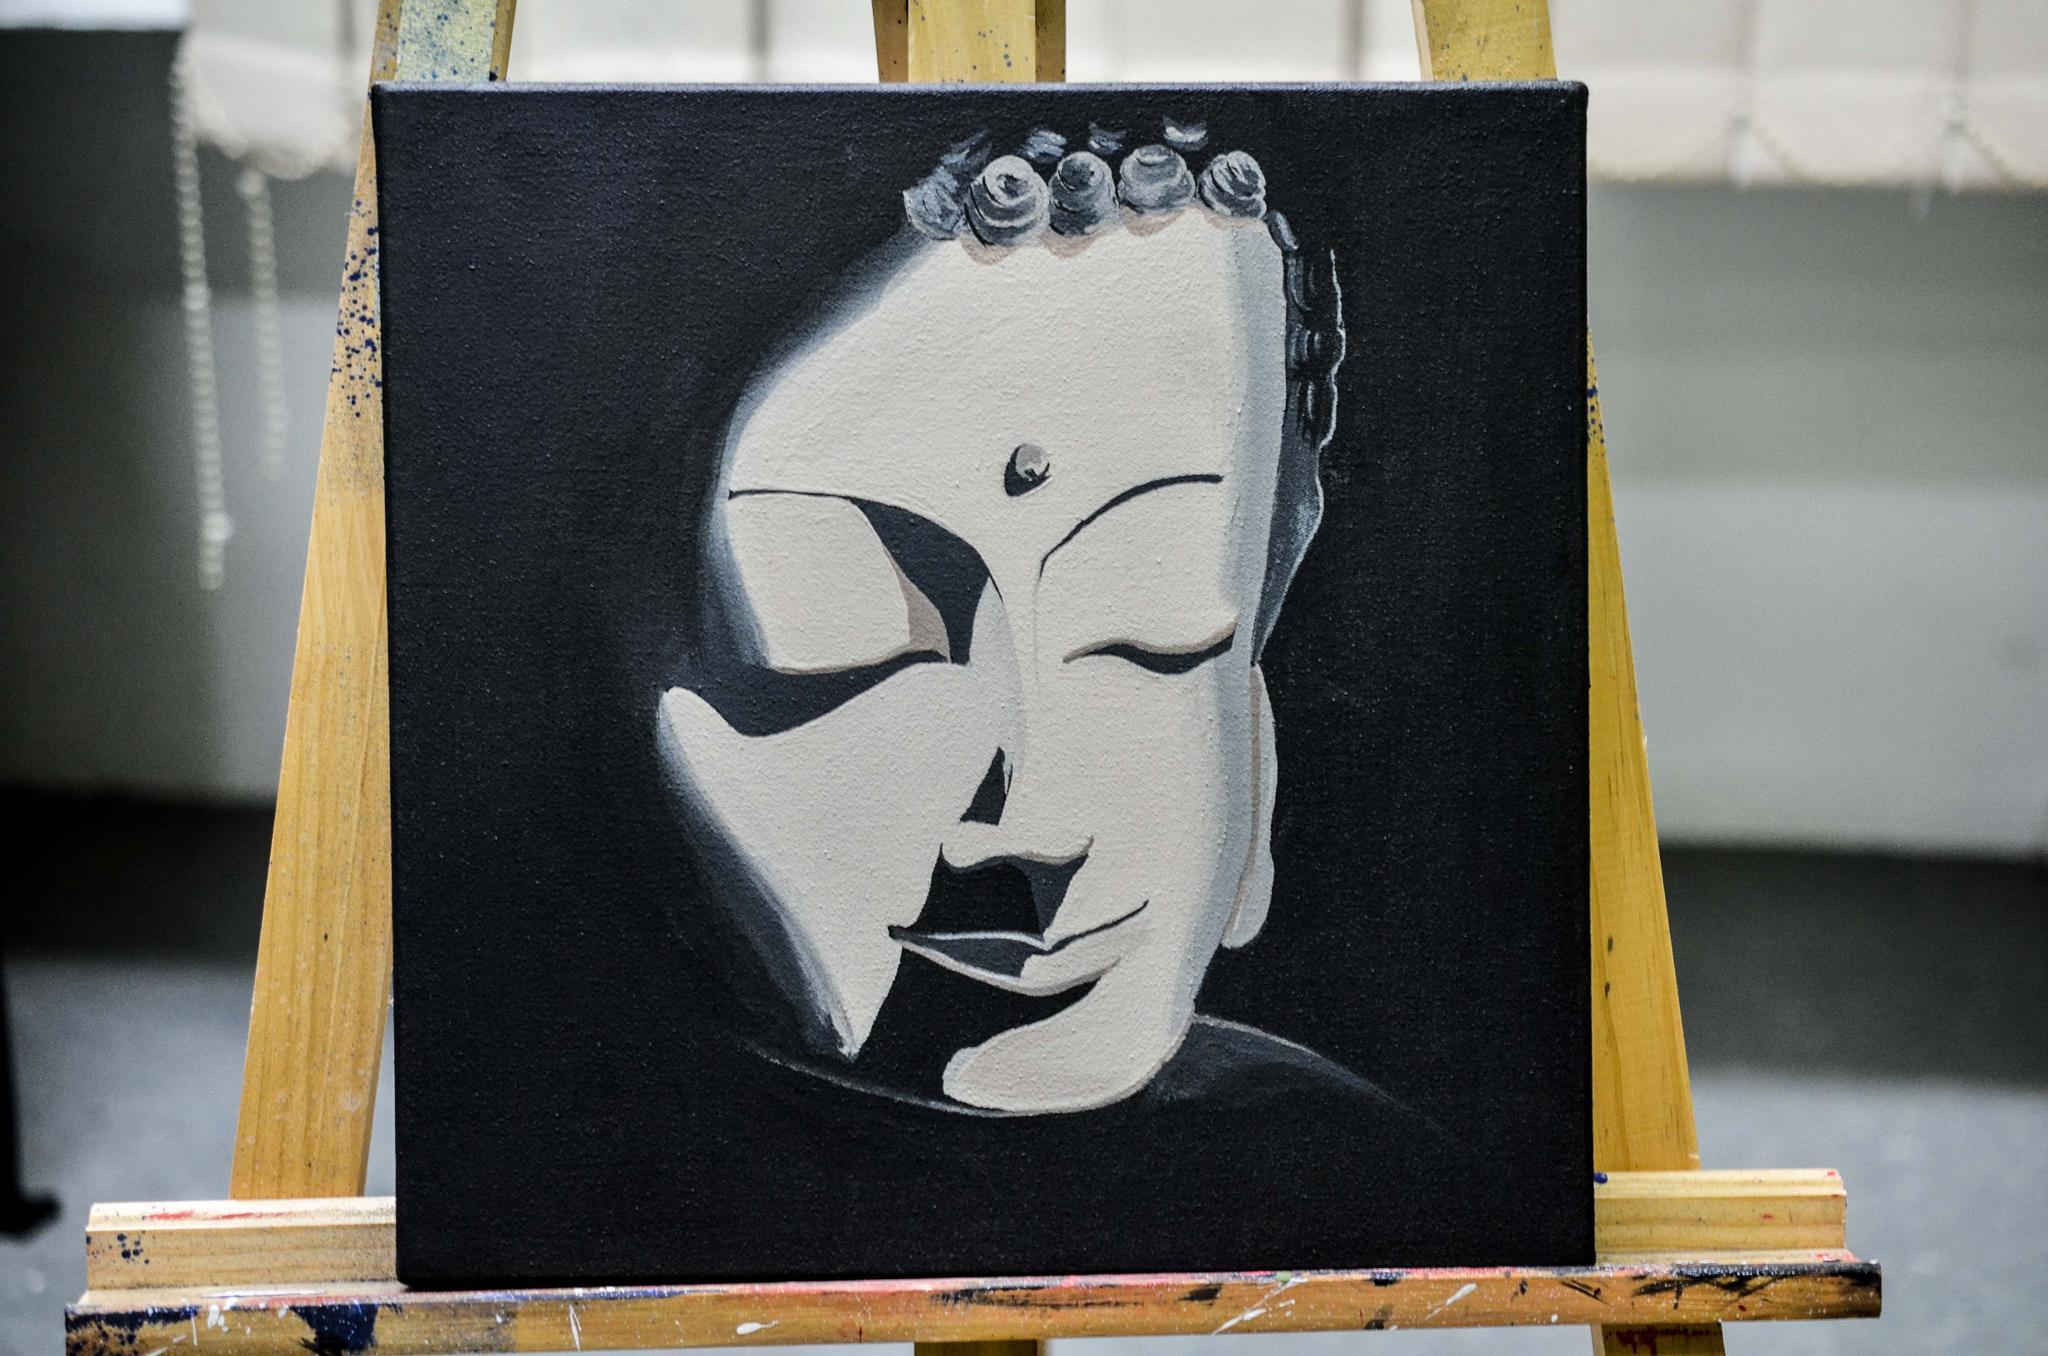 """SMILING BUDDHA"" by Kalvintaka Tan"